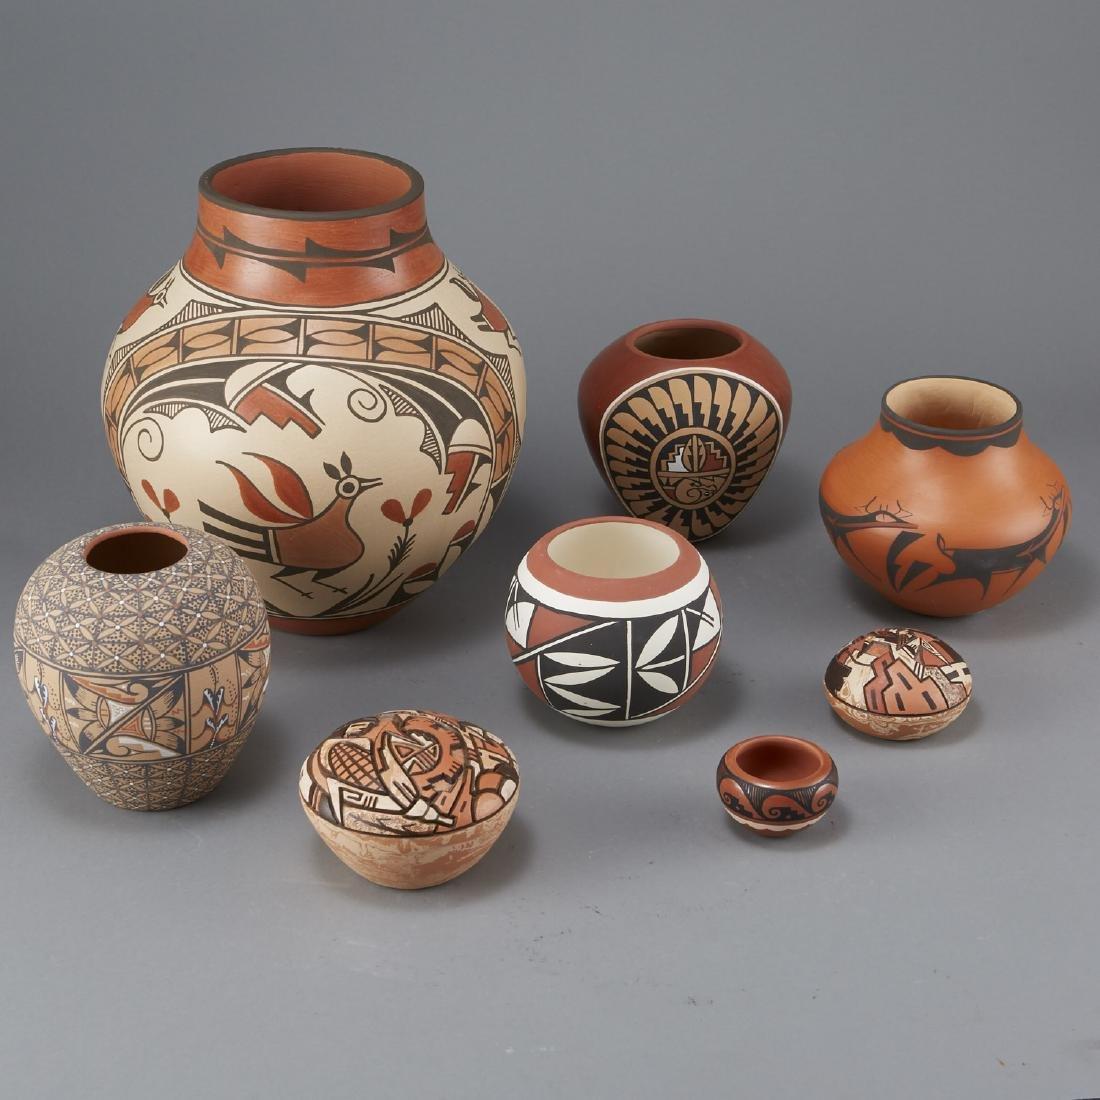 8 Pueblo Pottery Jars Largest 11 3/4 in